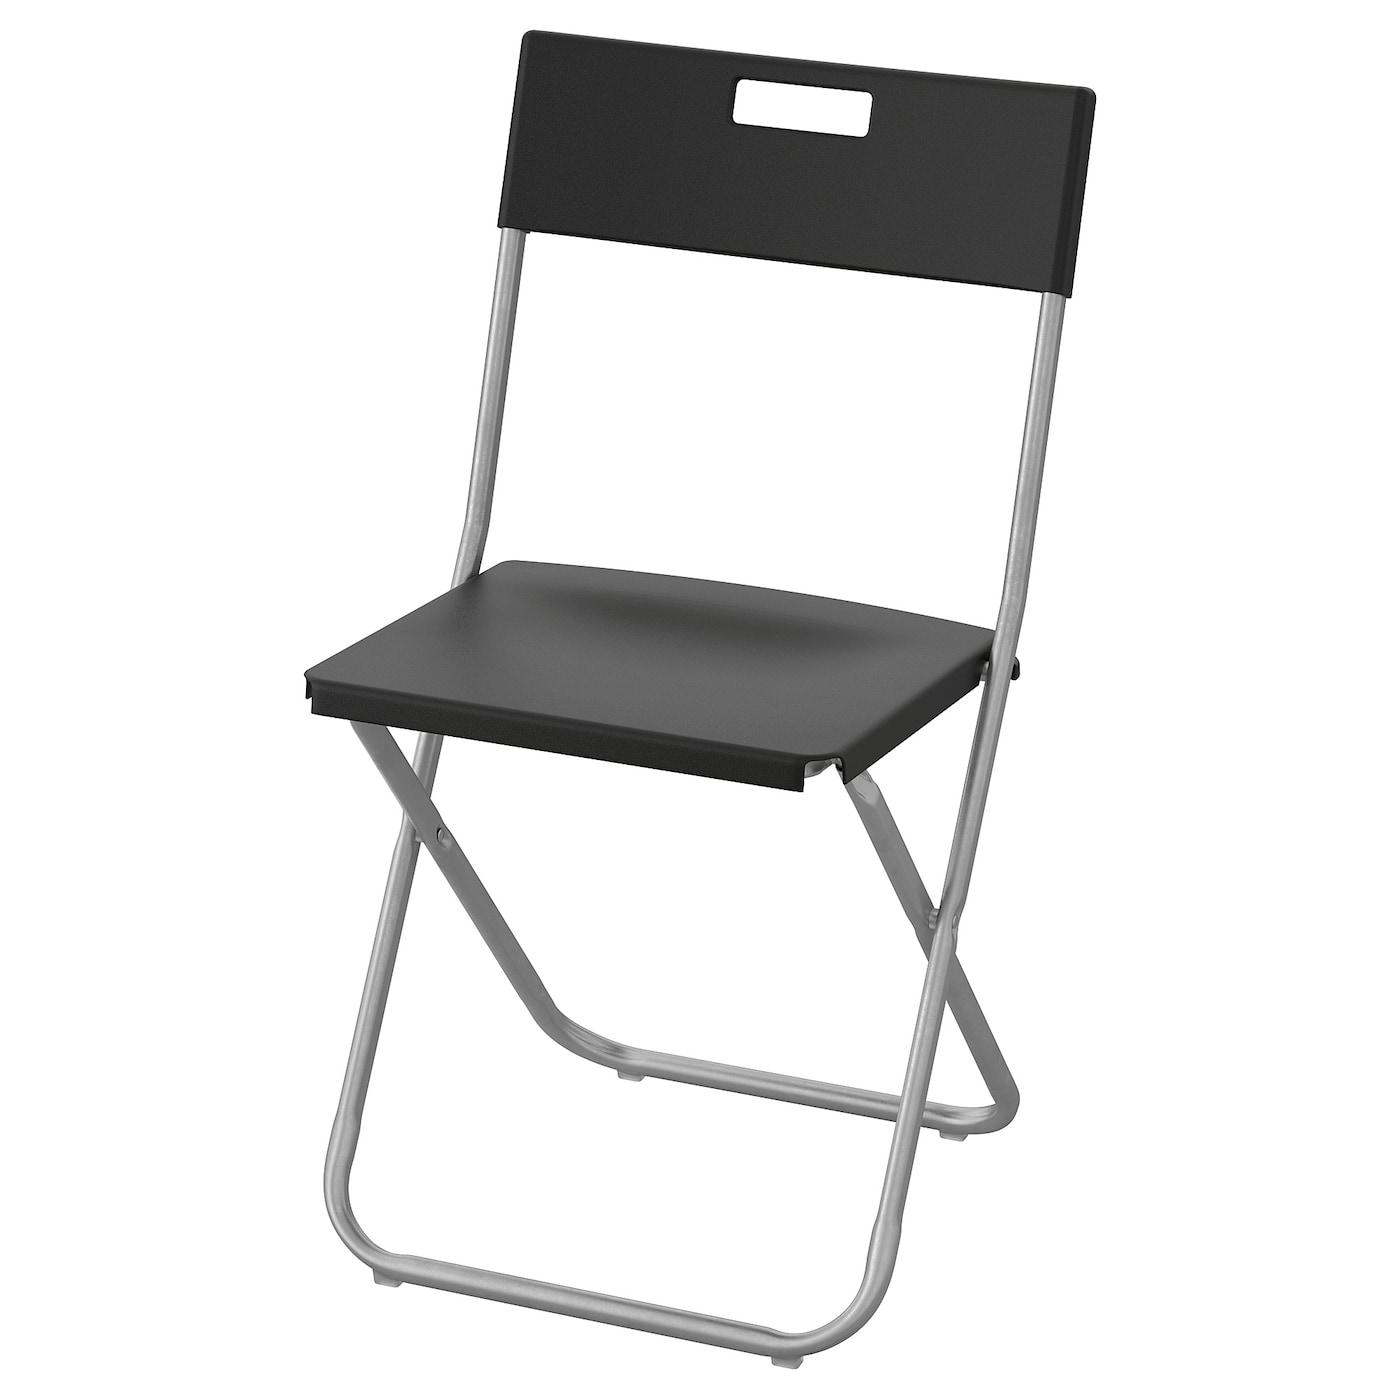 GUNDE Folding chair - black